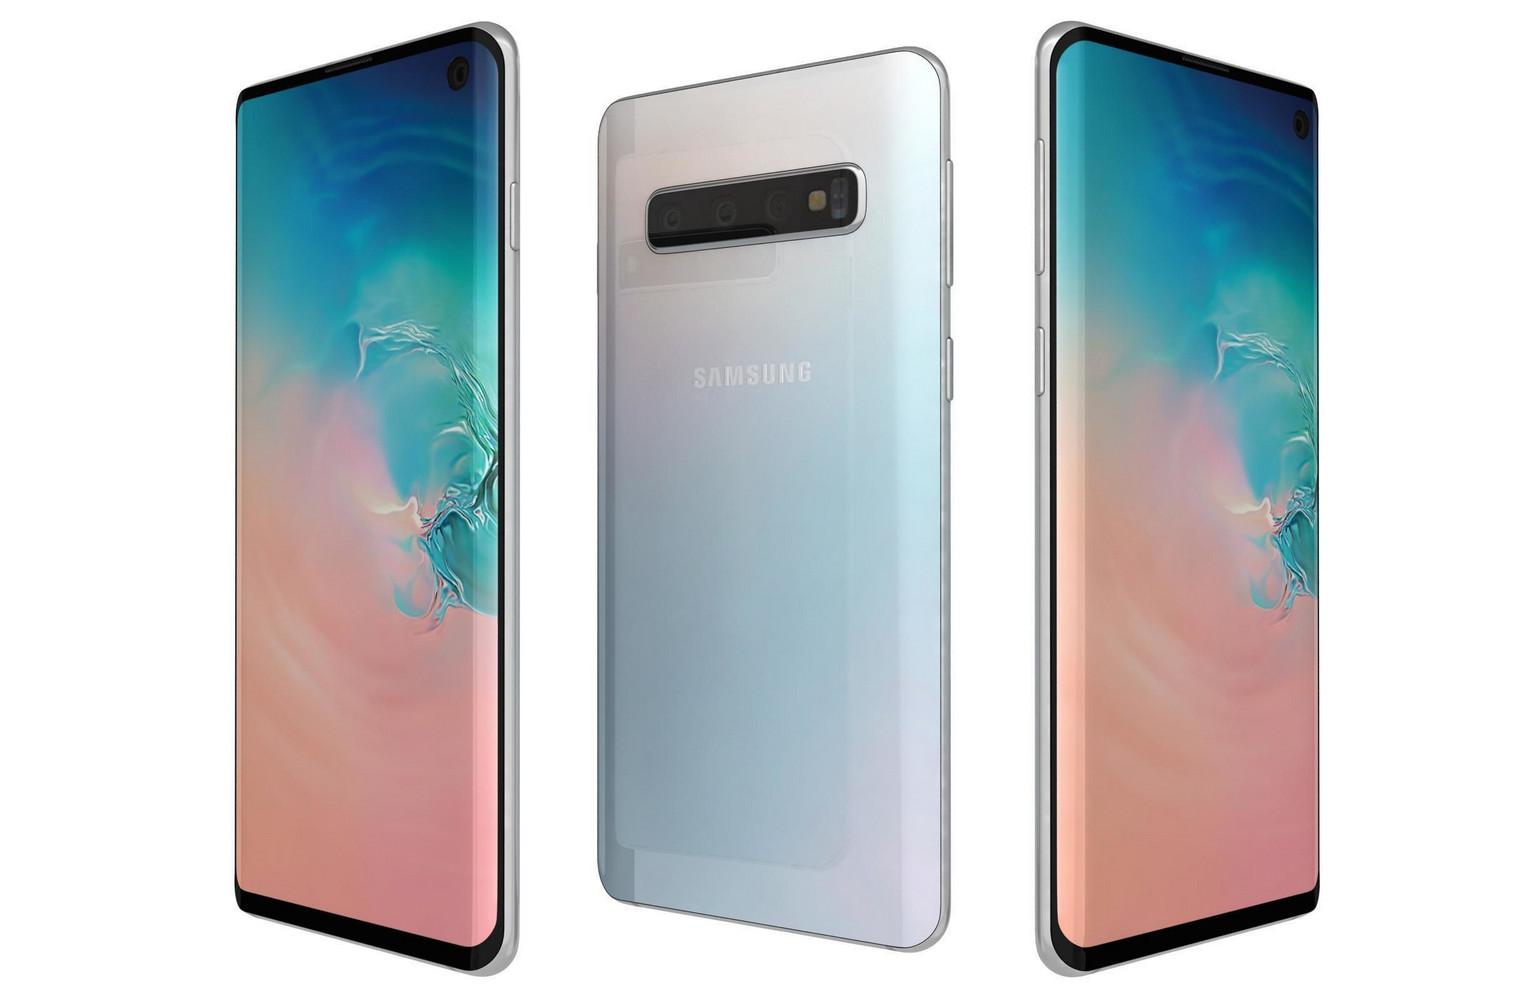 thumbnail 16 - Samsung Galaxy S10 128GB 512GB, Unlocked AT&T Verizon TMO Sprint, All Colors (P)